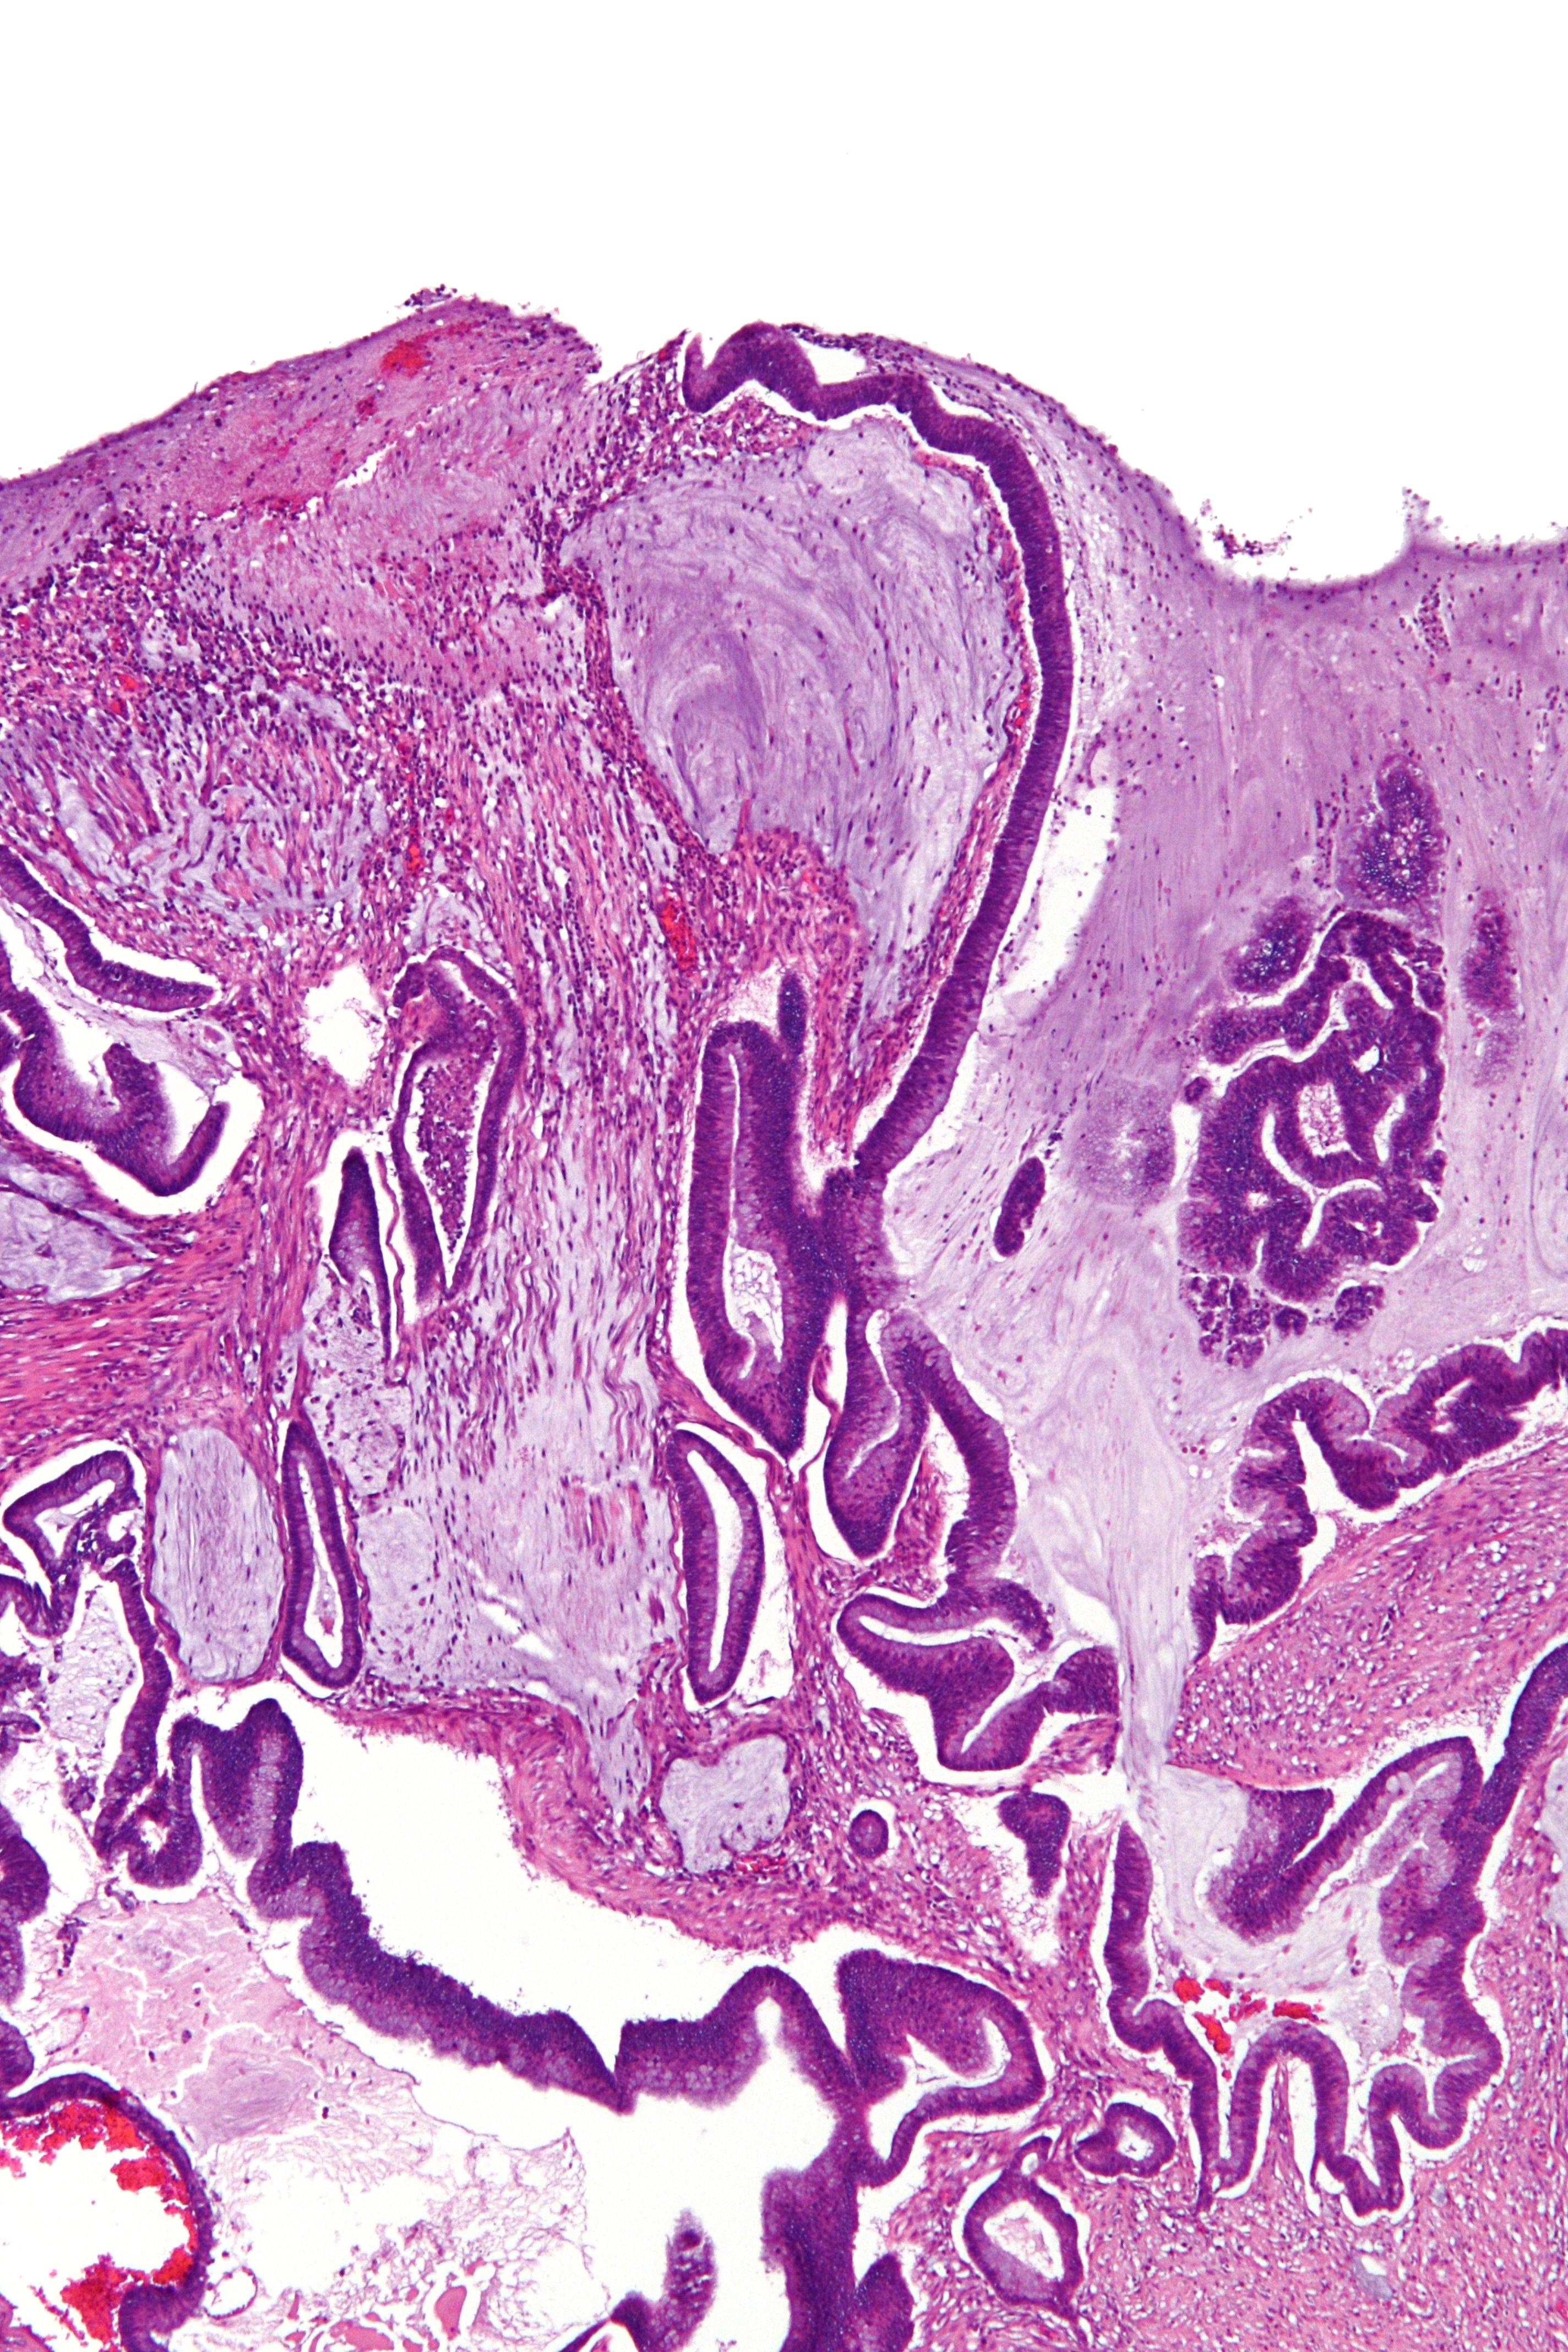 Mucinous colorectal cancer. Meniu de navigare